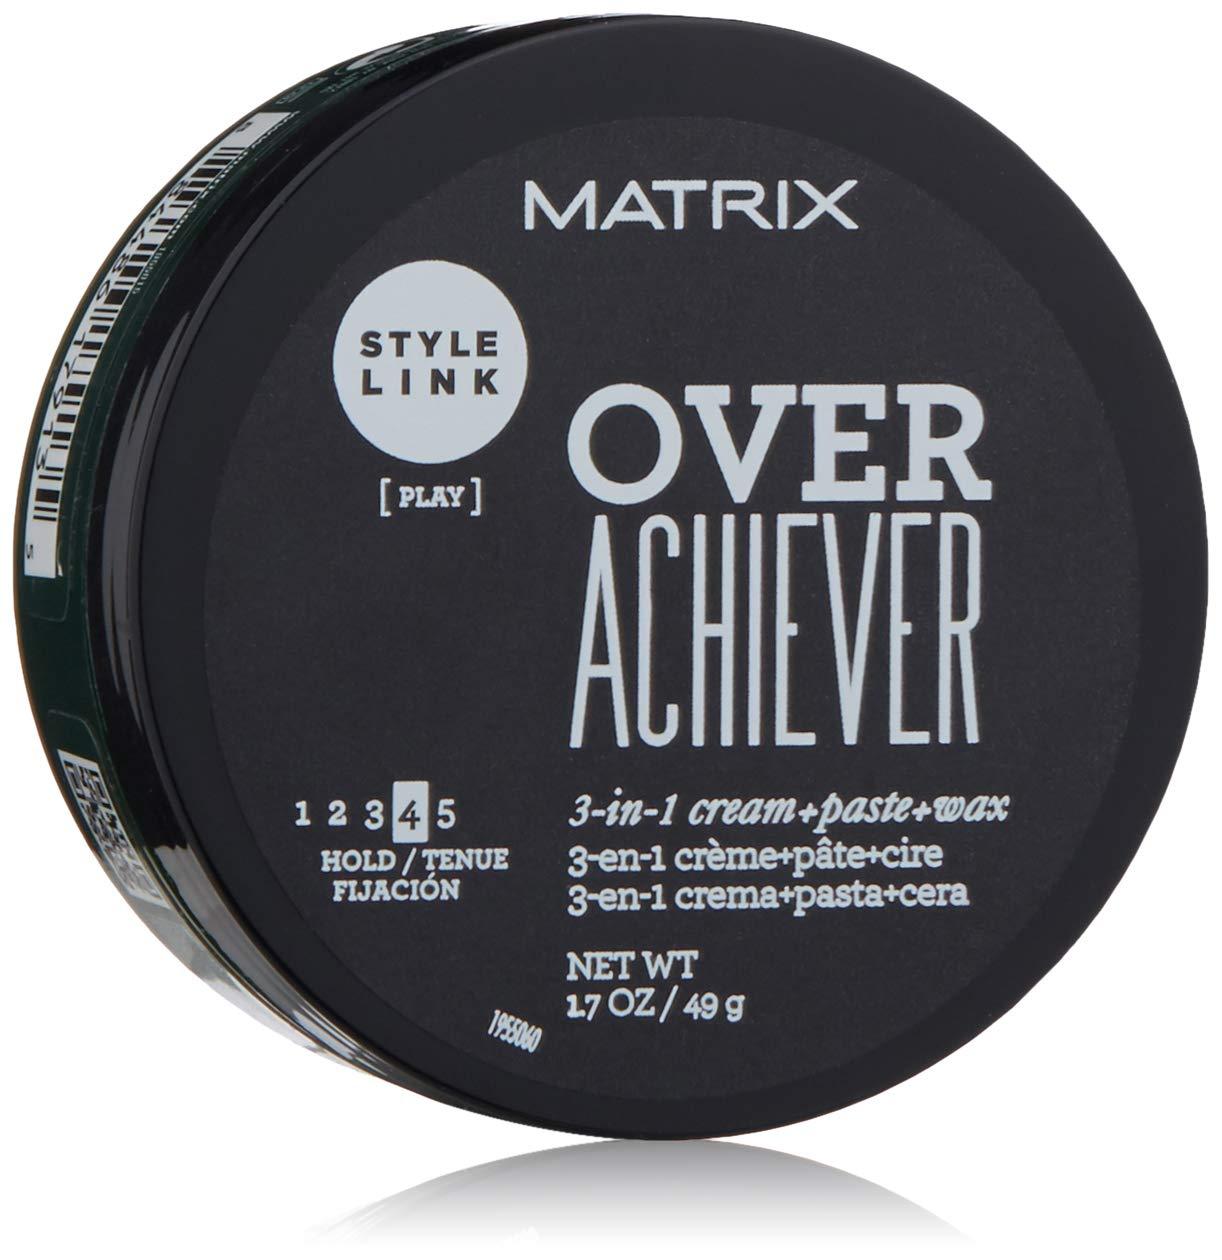 Matrix Style Link Over Achiever 3-In-1 Cream Paste Wax, 1.7 Fl. Oz.